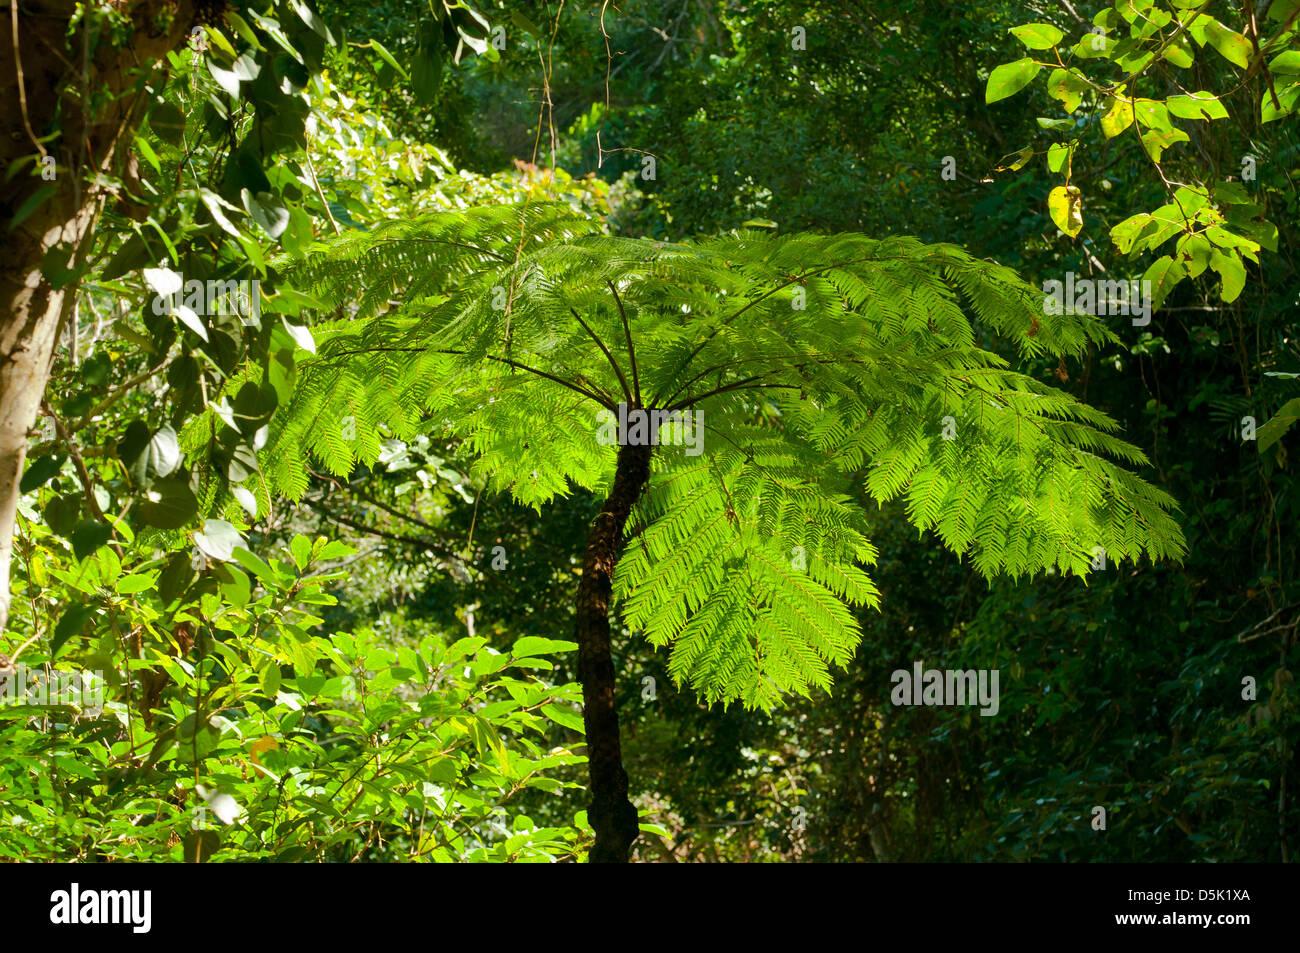 Cyanthea cooperi, helecho escamoso Imagen De Stock